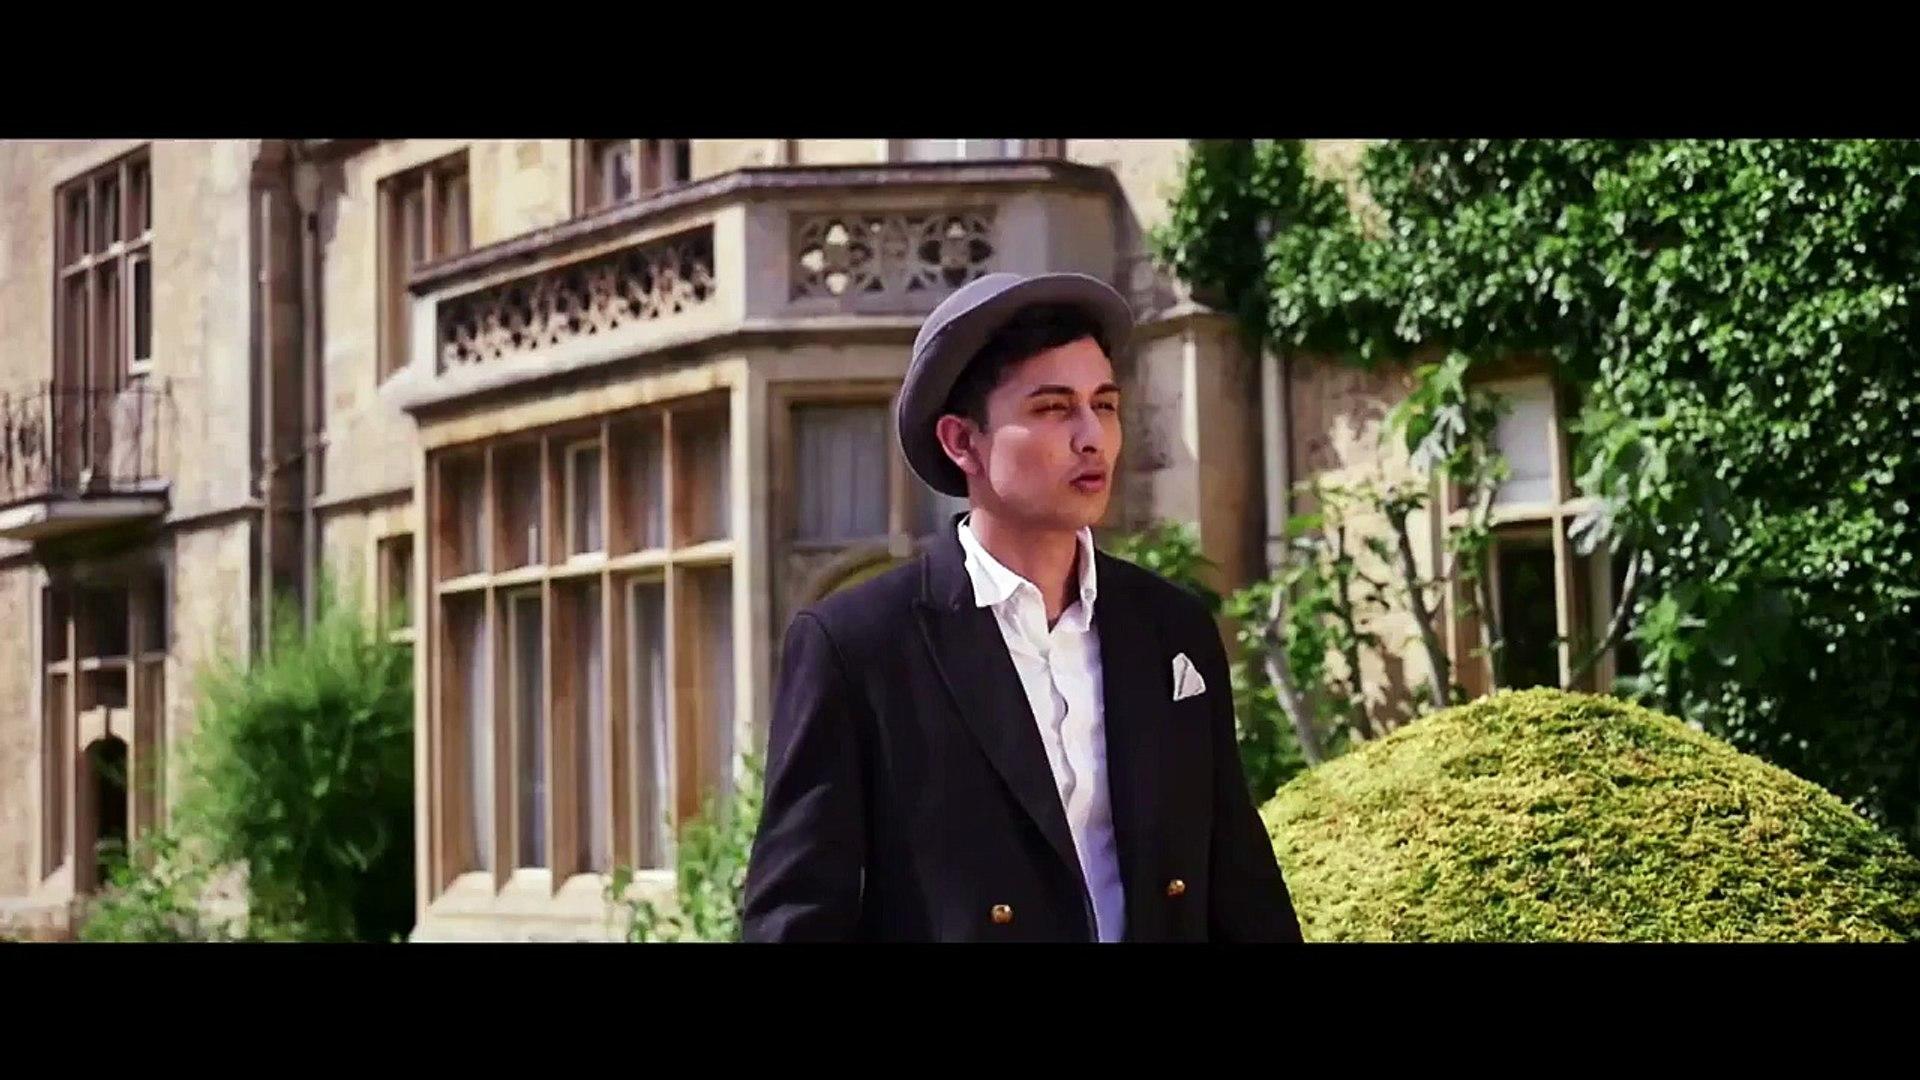 Dheere HD Full Video Song [2014] - Zac Knight